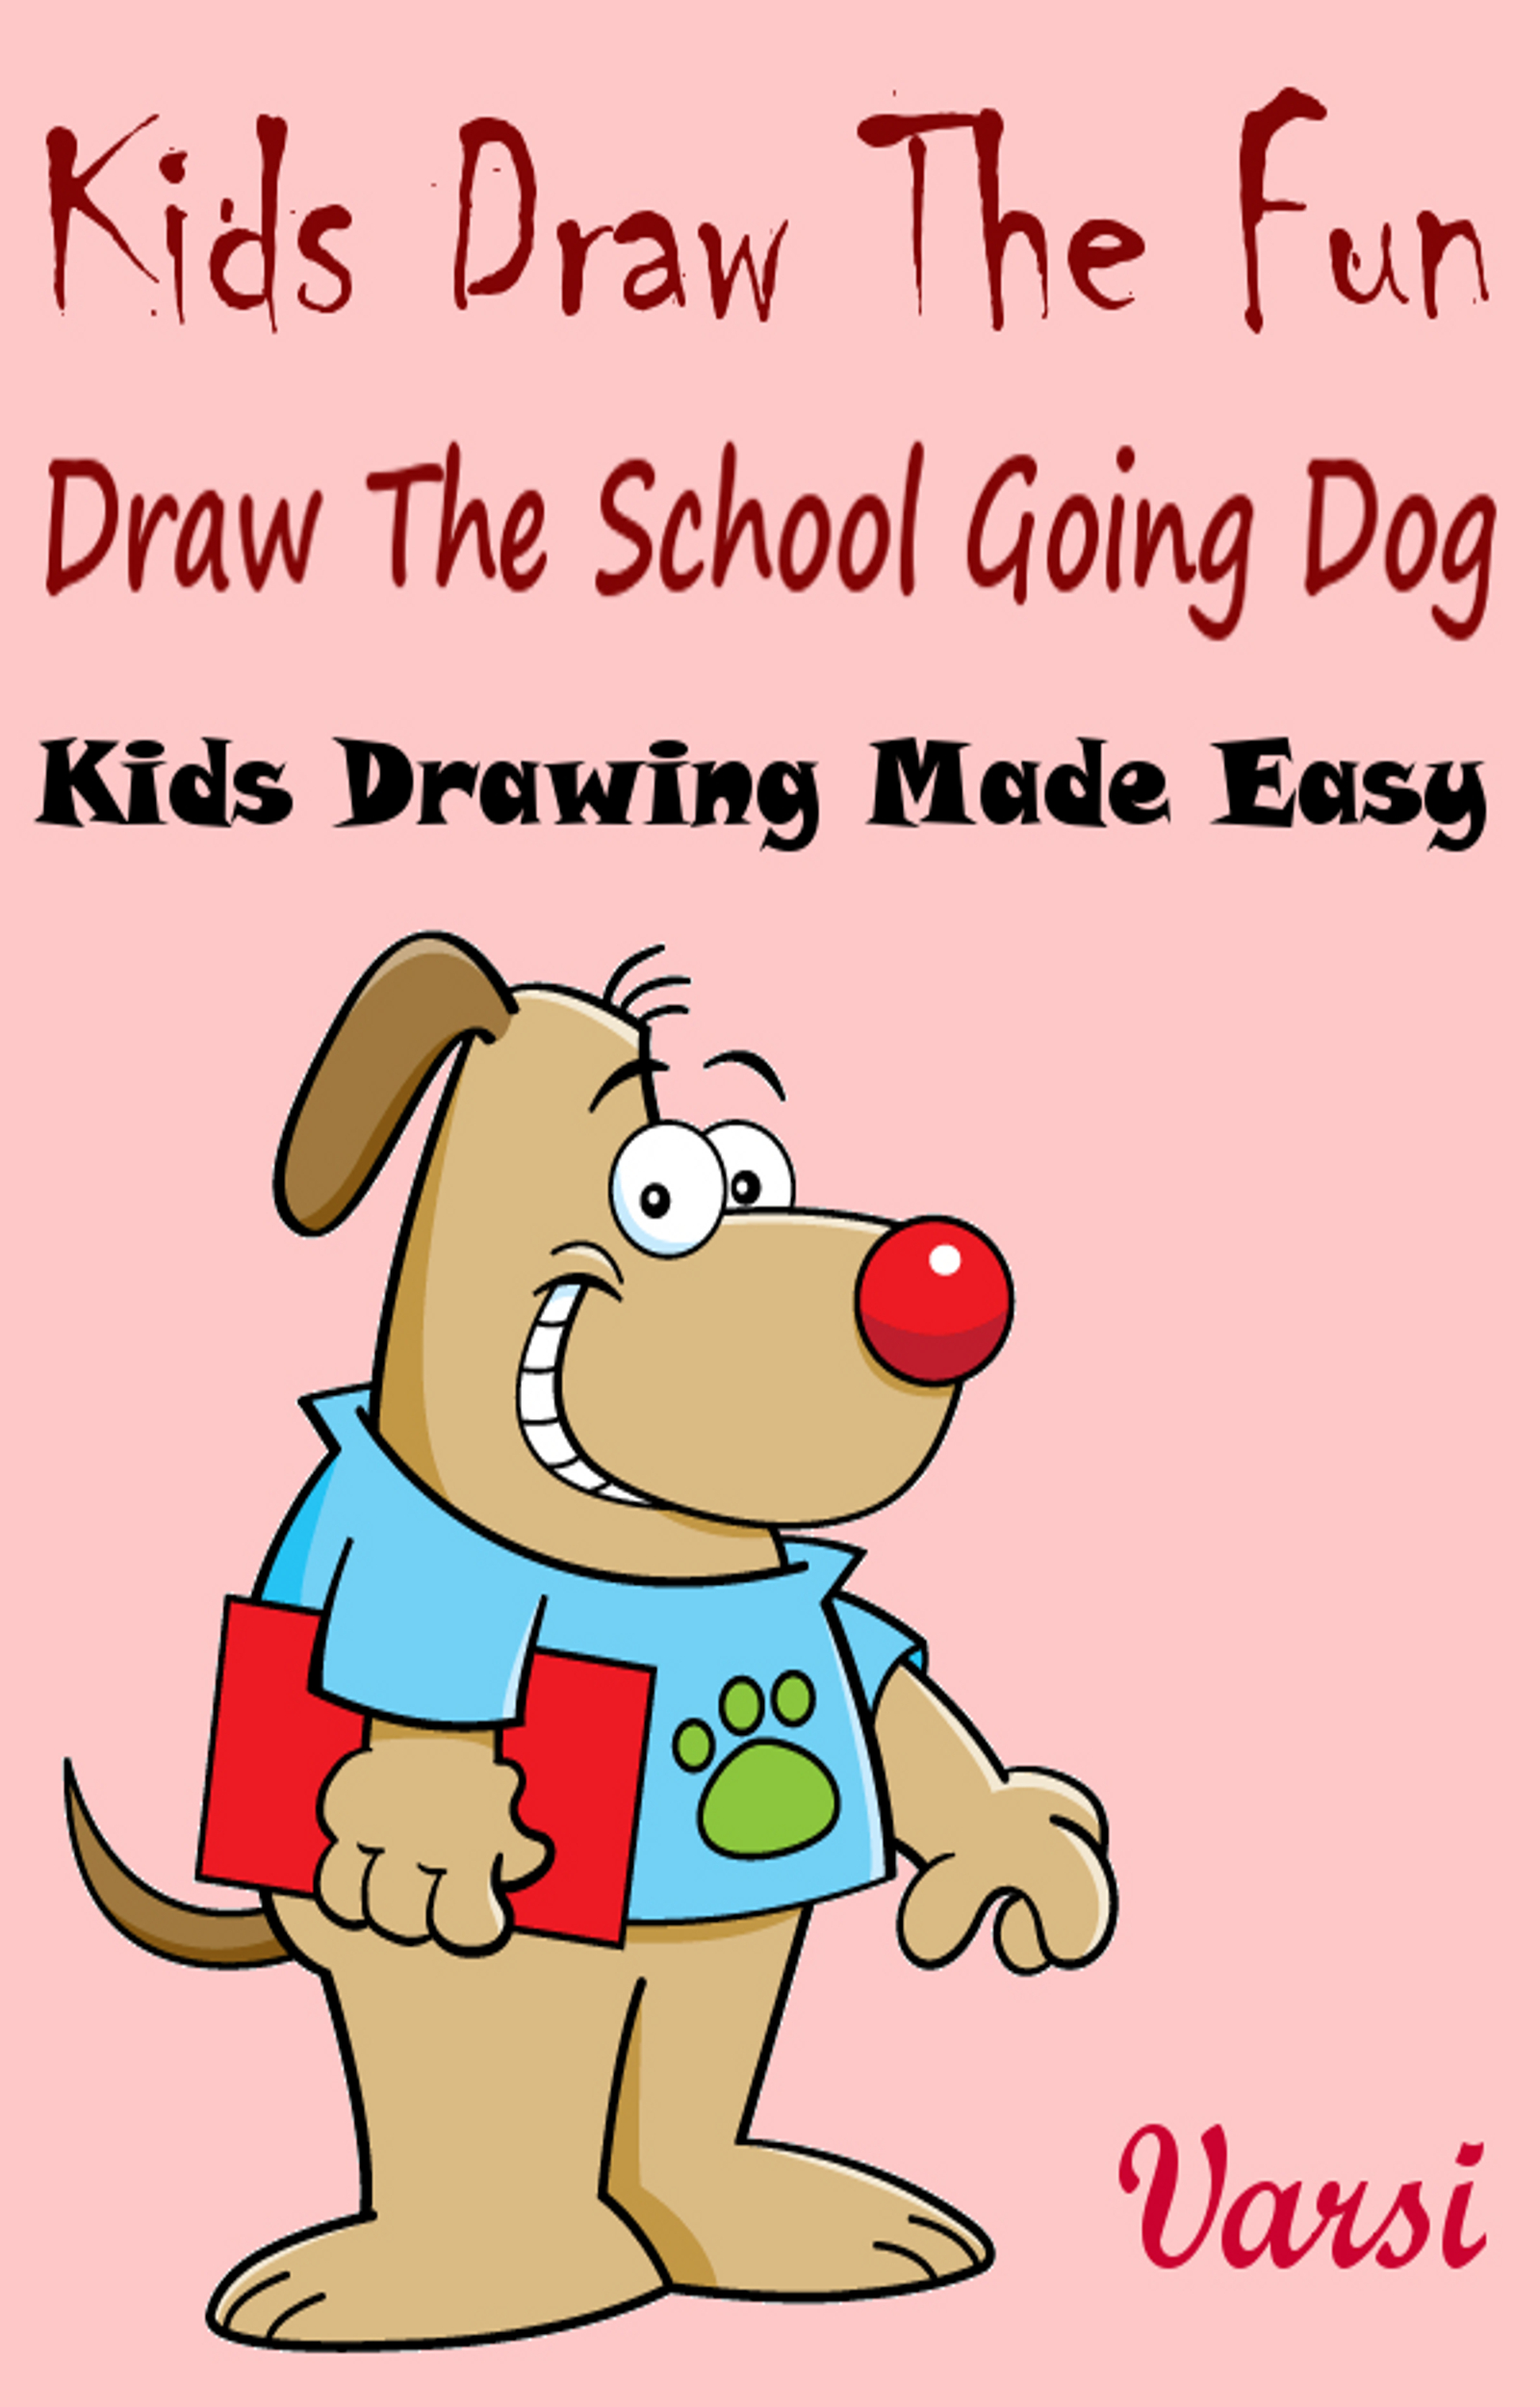 Kids Draw The Fun : Draw The School Going Dog